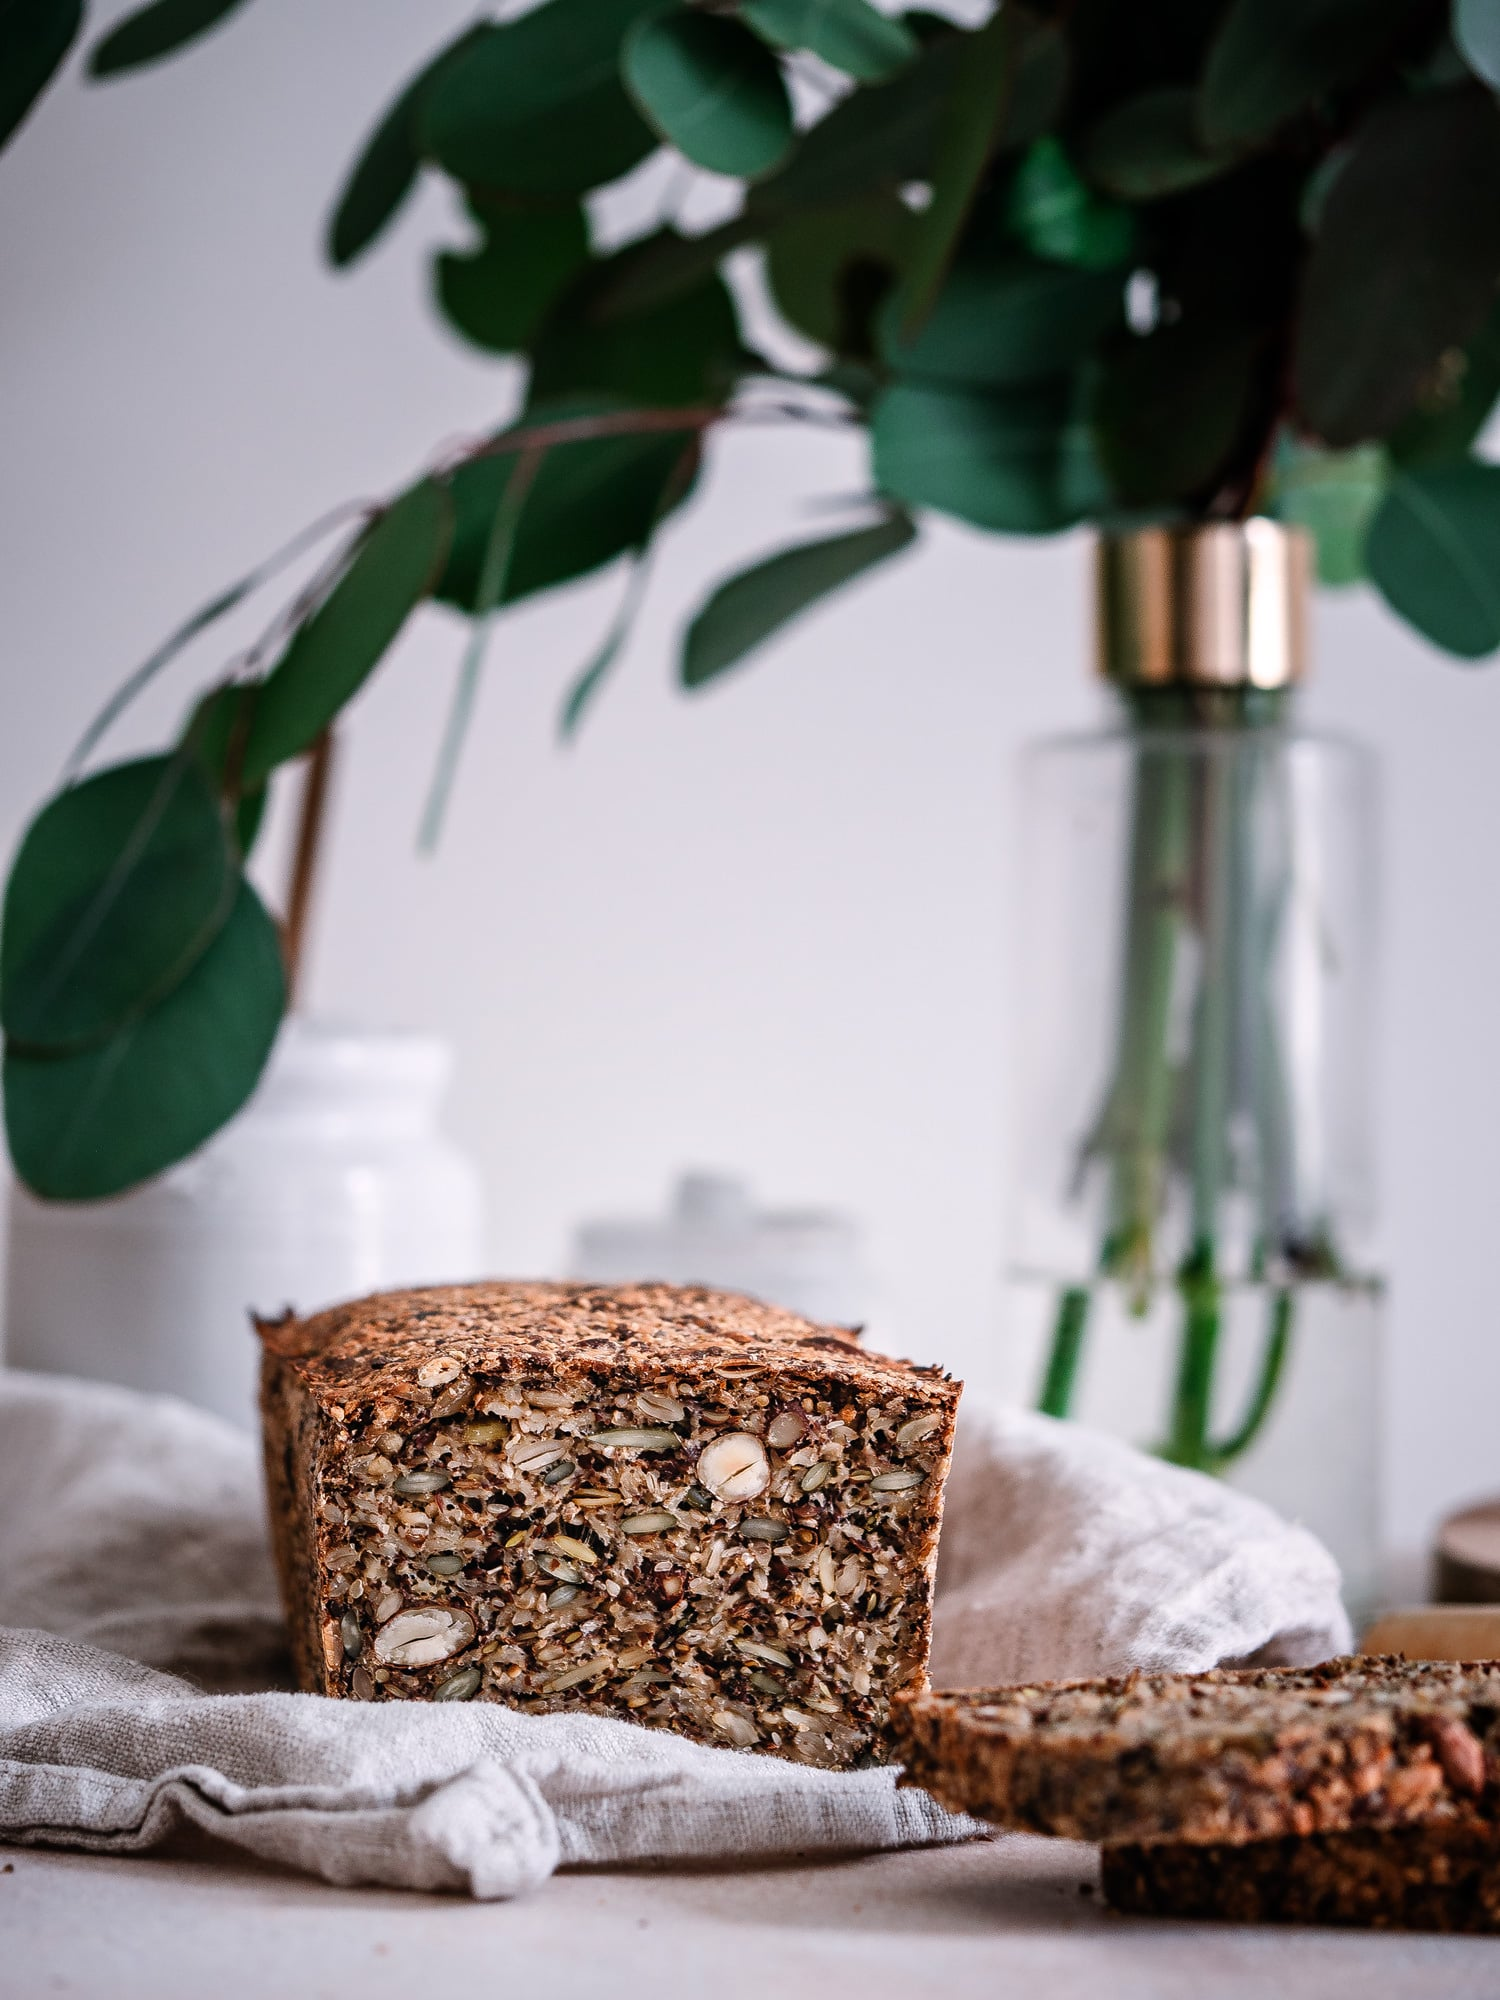 Life changing Bread in Anschnitt